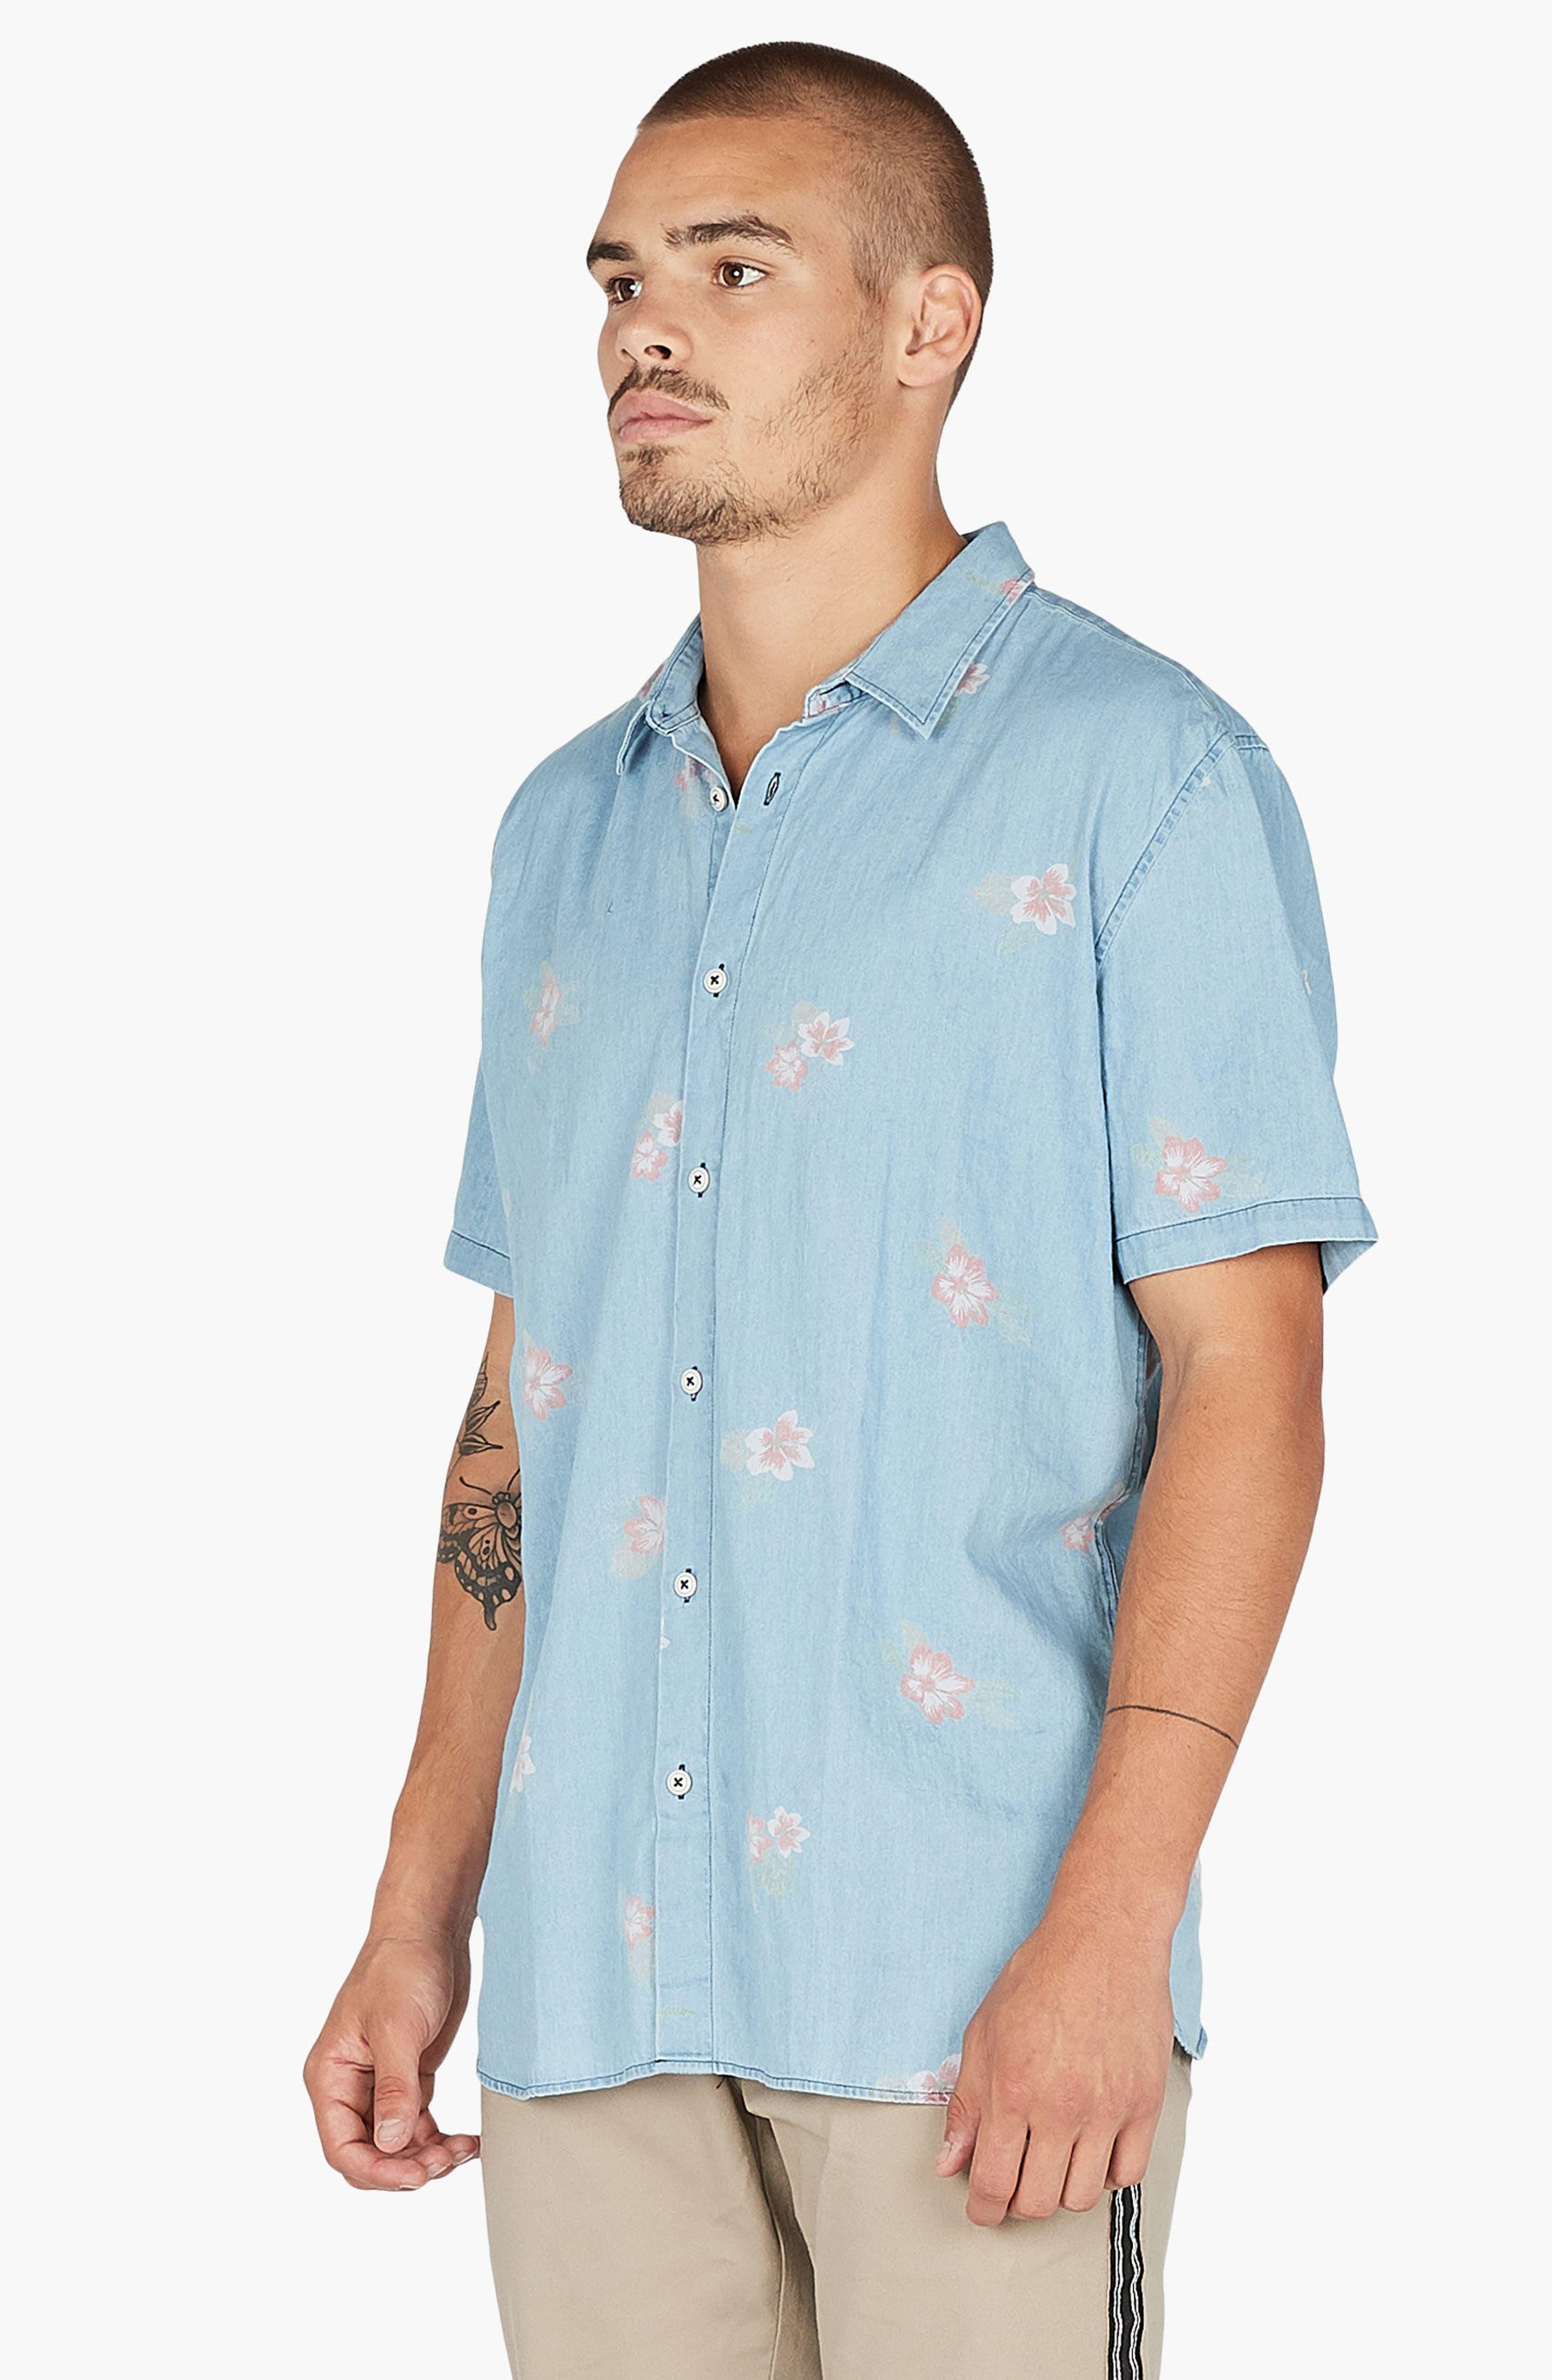 Holiday Woven Shirt,                             Alternate thumbnail 2, color,                             Indigo/ Floral